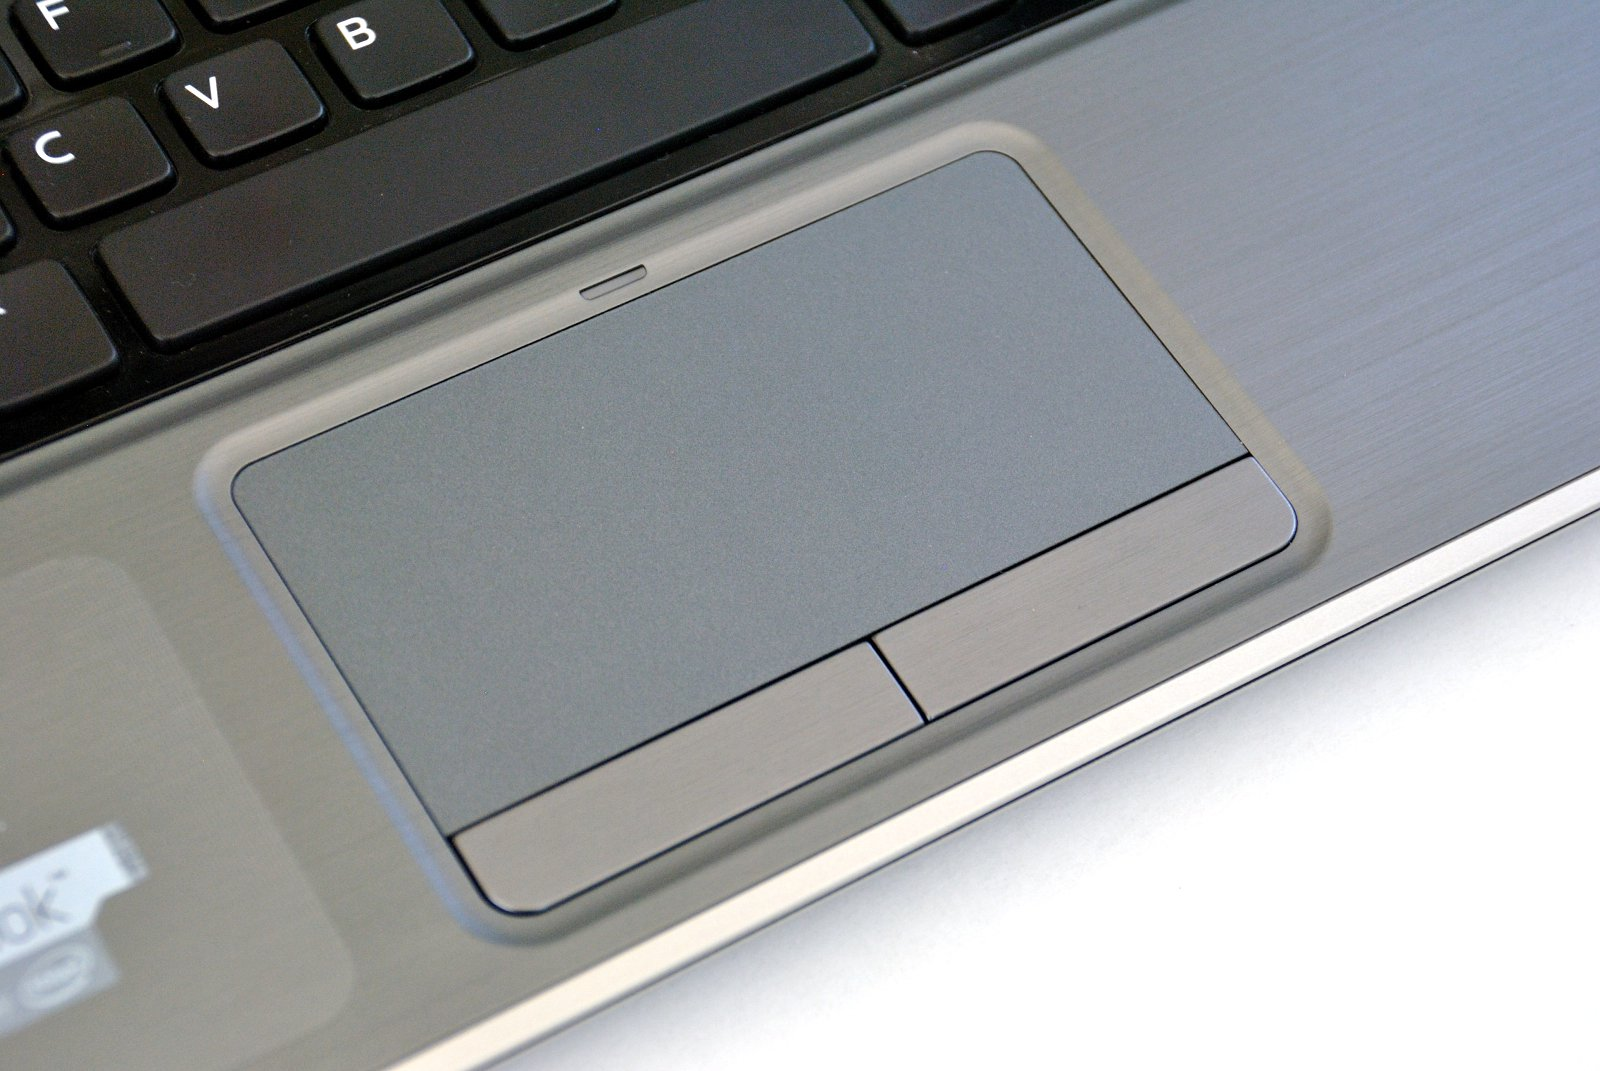 Drivers Dell Inspiron 14Z 5423 Notebook 5560 HSPA+ Mini Card